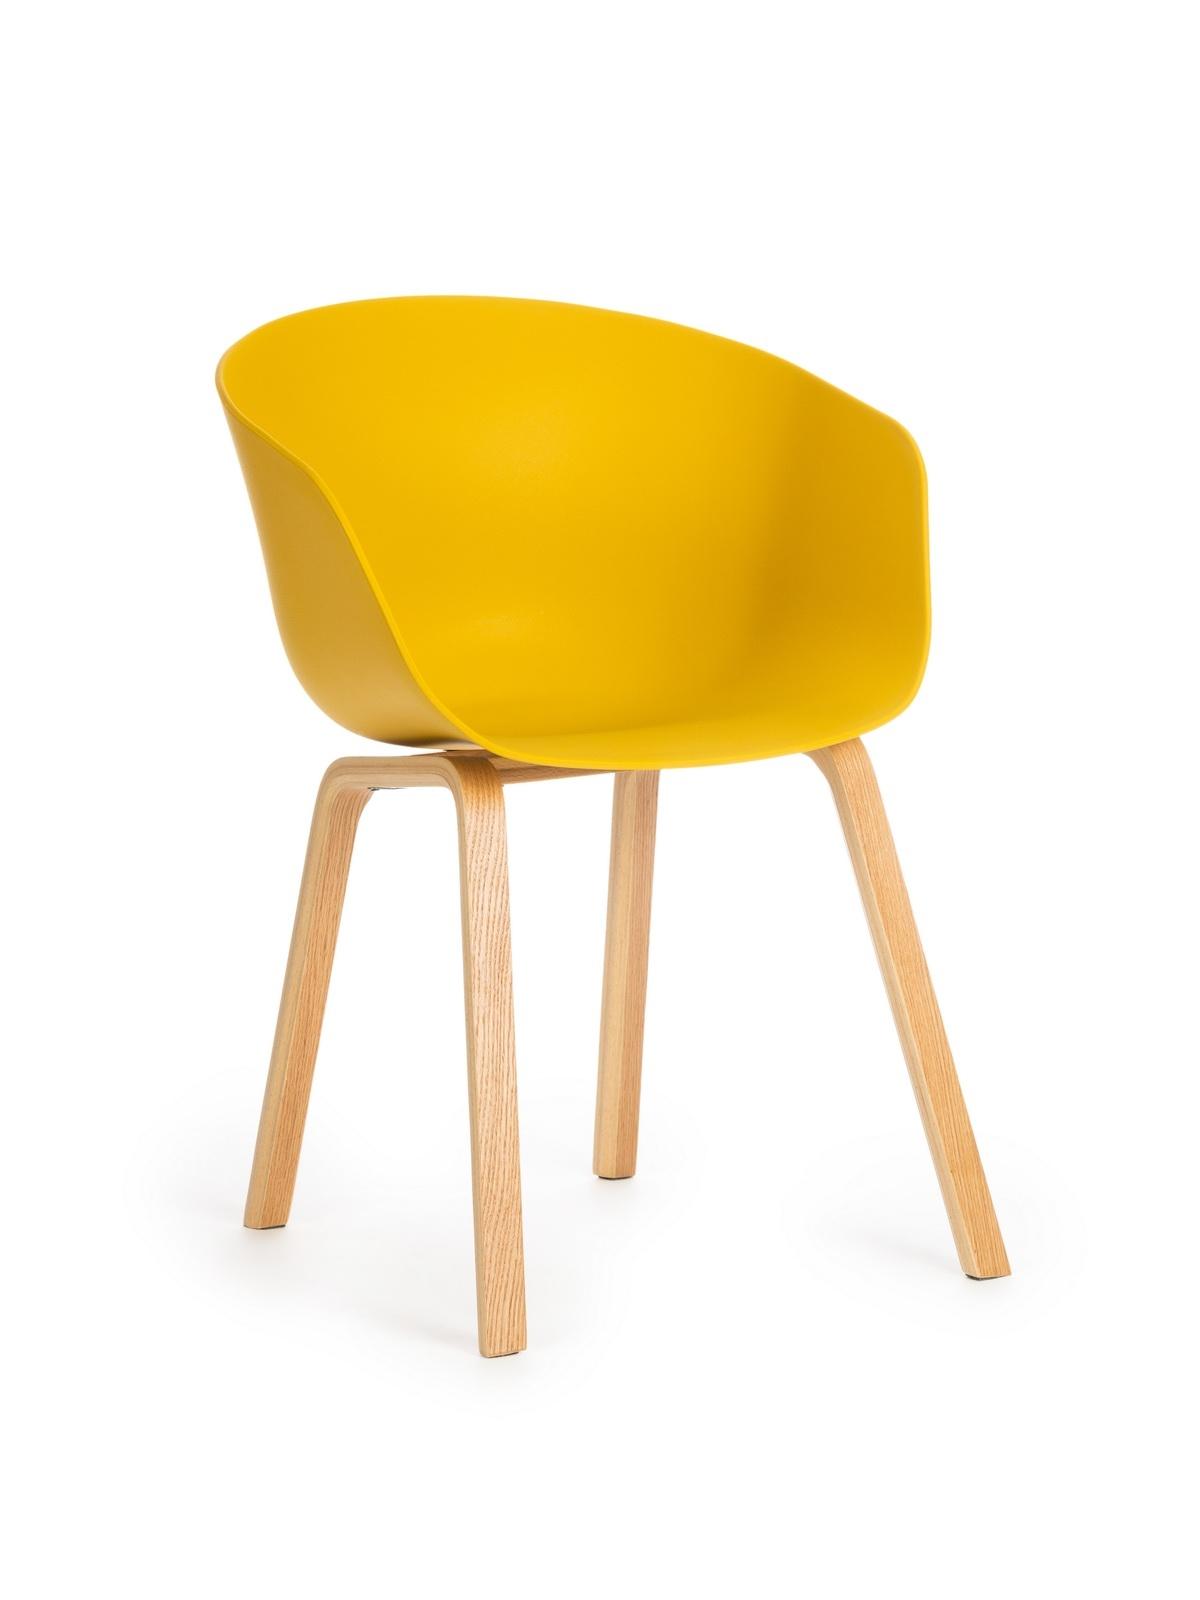 Scaun din plastic cu picioare din lemn Iris Yellow, l55xA56xH80 cm